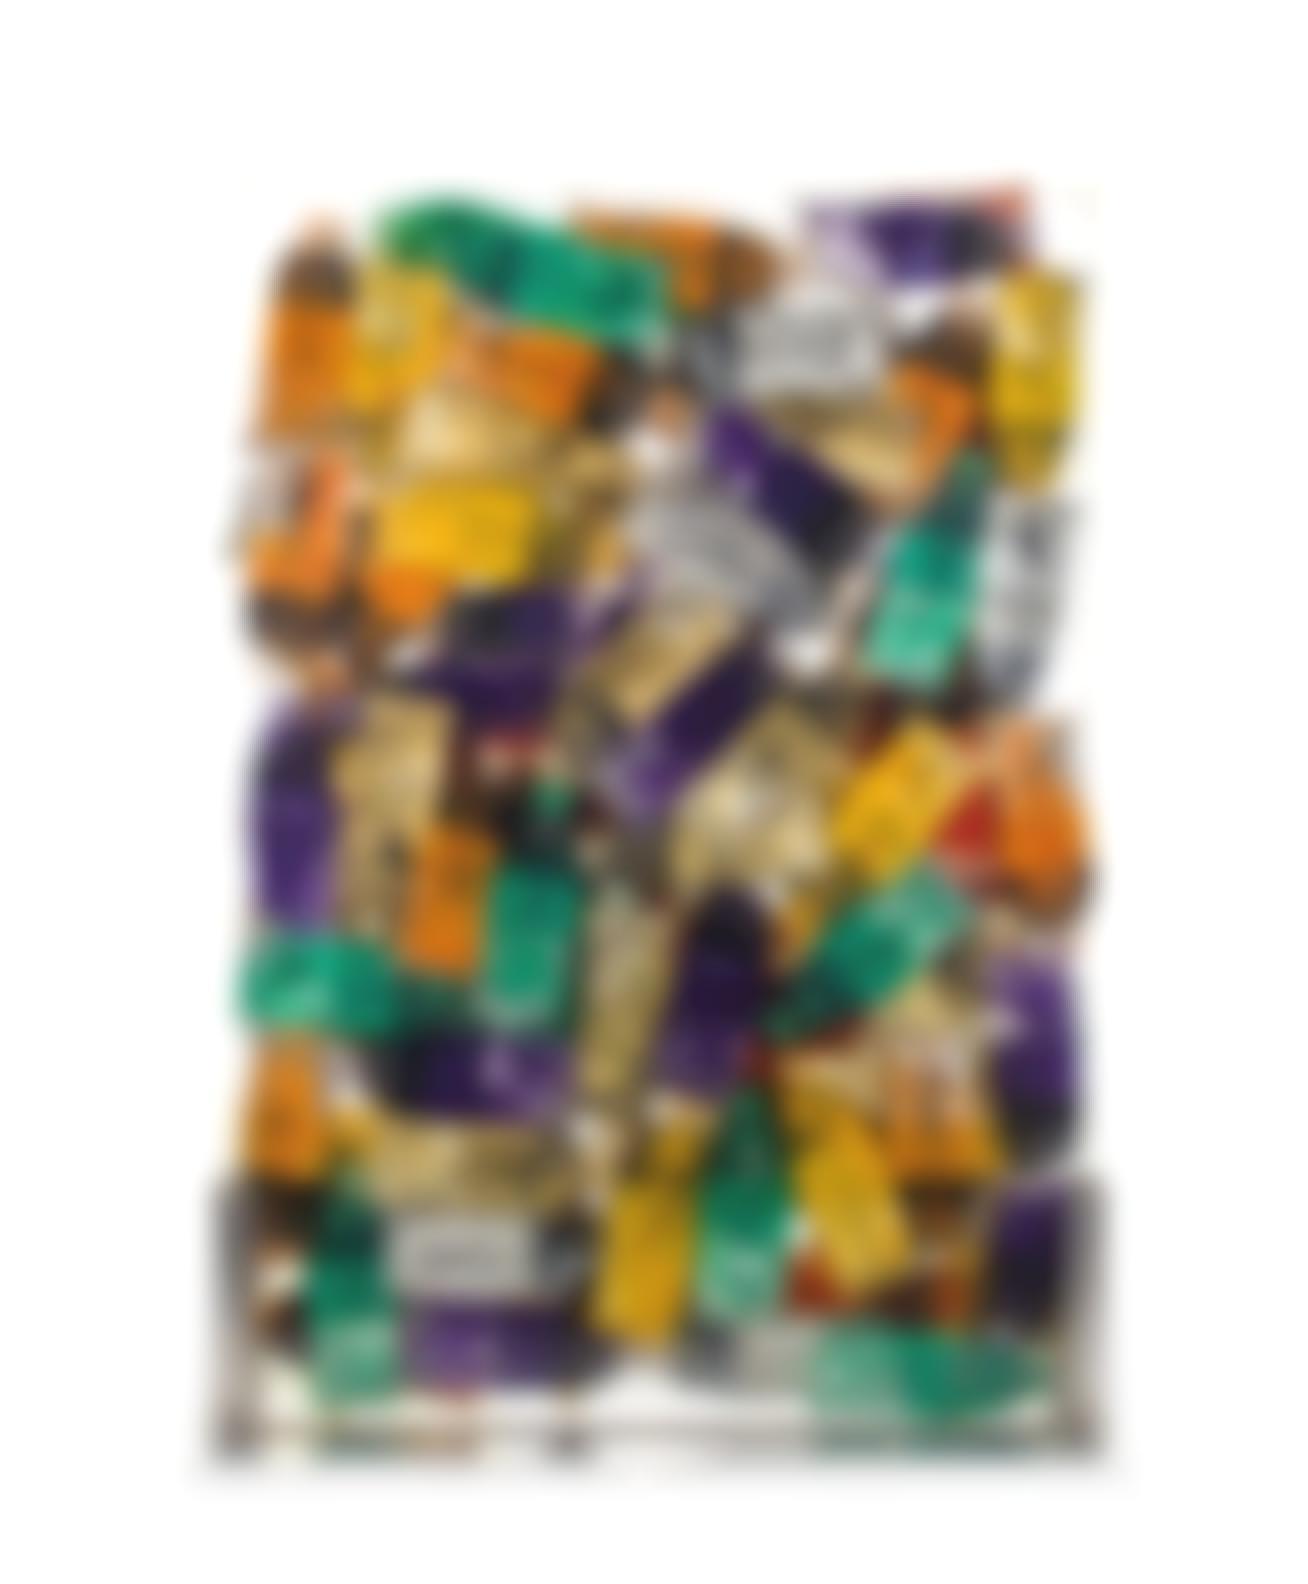 Arman-Untitled (Paint Tubes)-2004